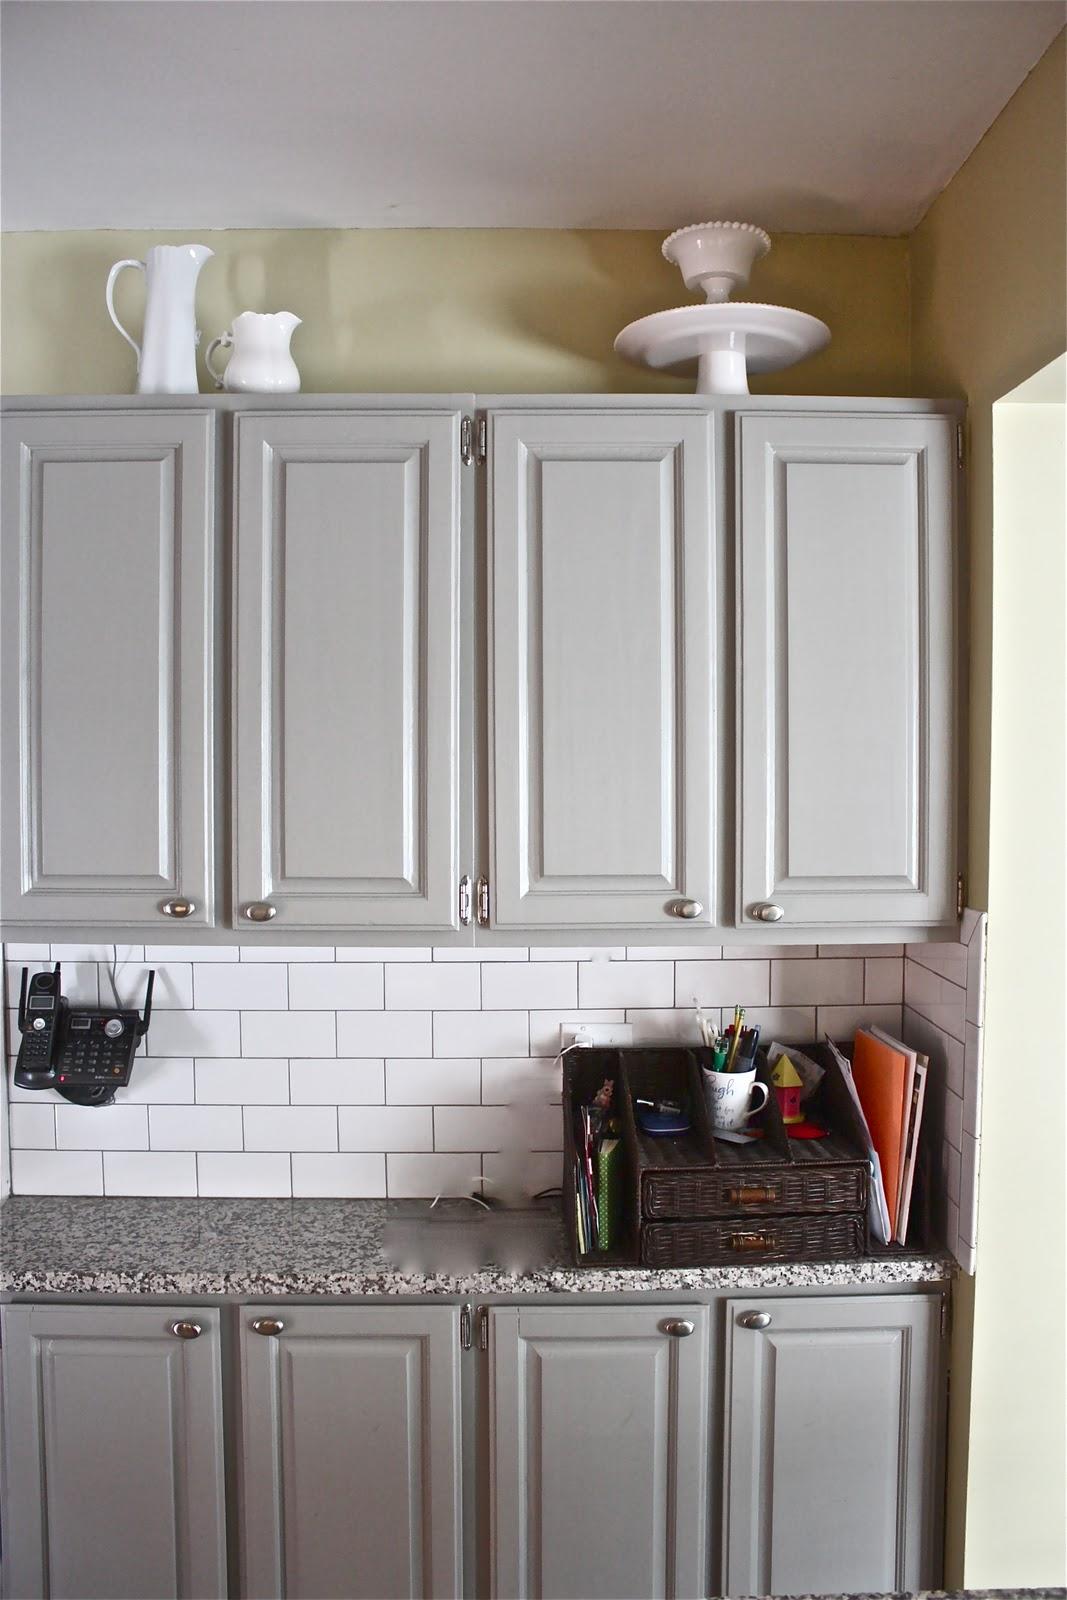 gray kitchen cabinets home depot martha stewart kitchen cabinets Stewart